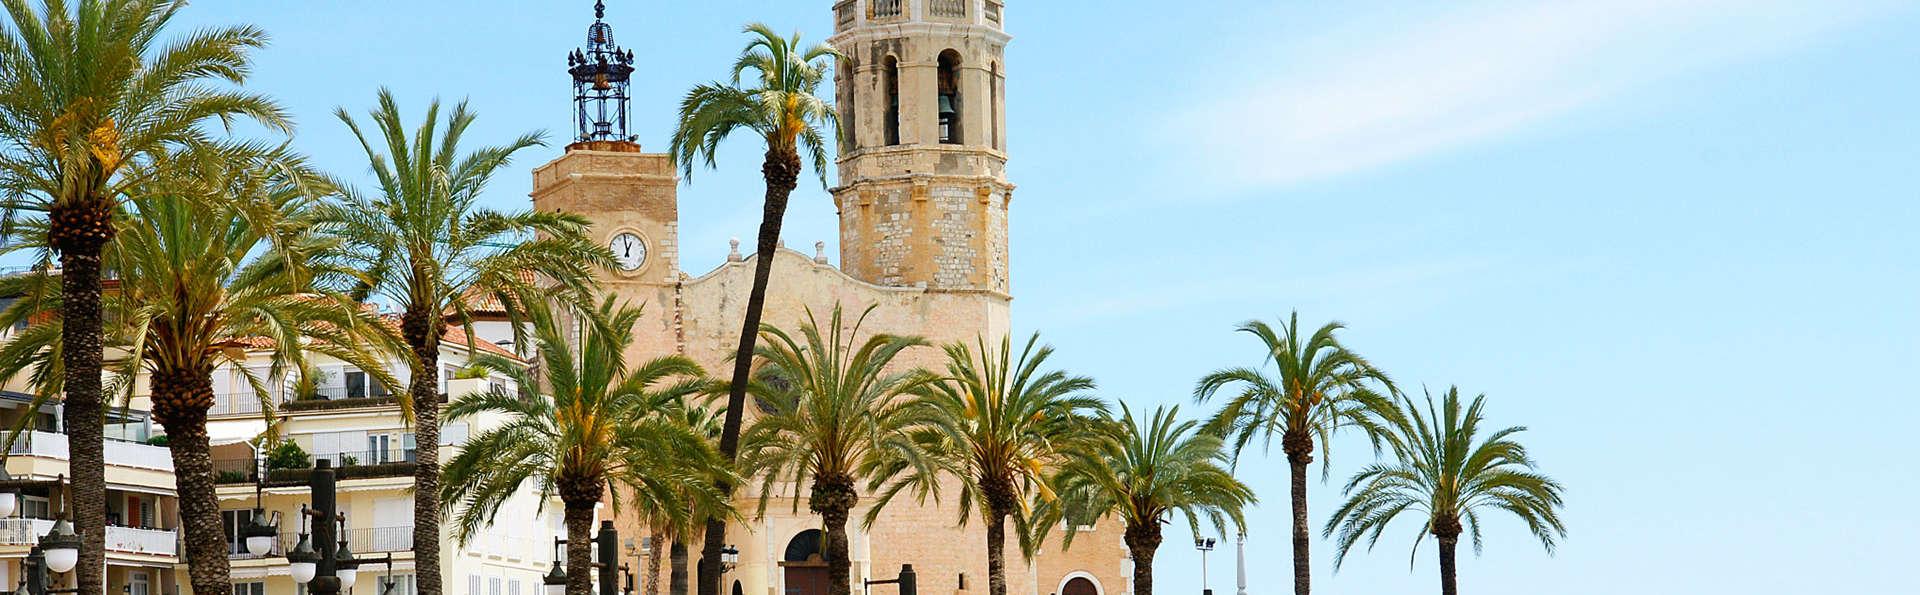 Hotel Sunway Playa Golf and Spa Sitges - EDIT_destination1.jpg